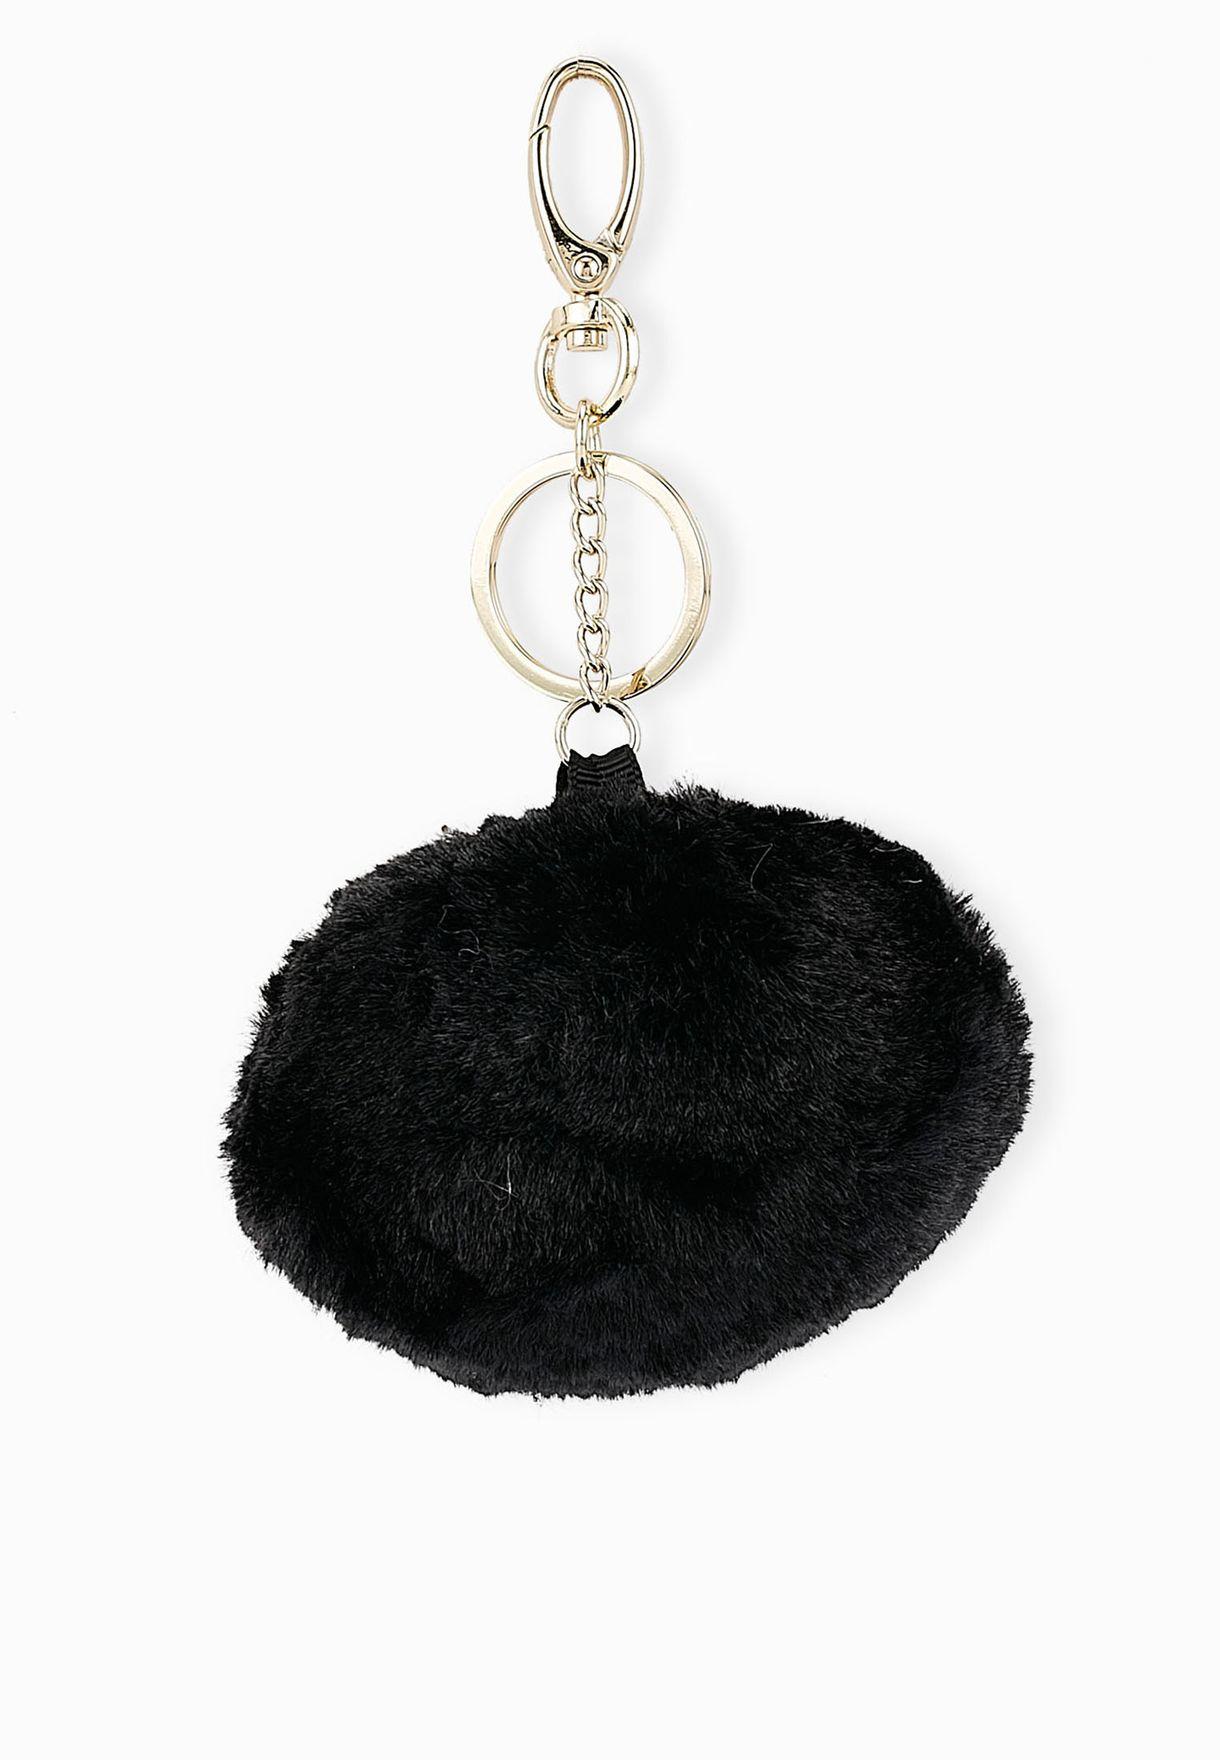 Shop Ginger black Big Pom Pom Key Ring for Women in Qatar - GI121AC80EFZ 54200be3e07e5